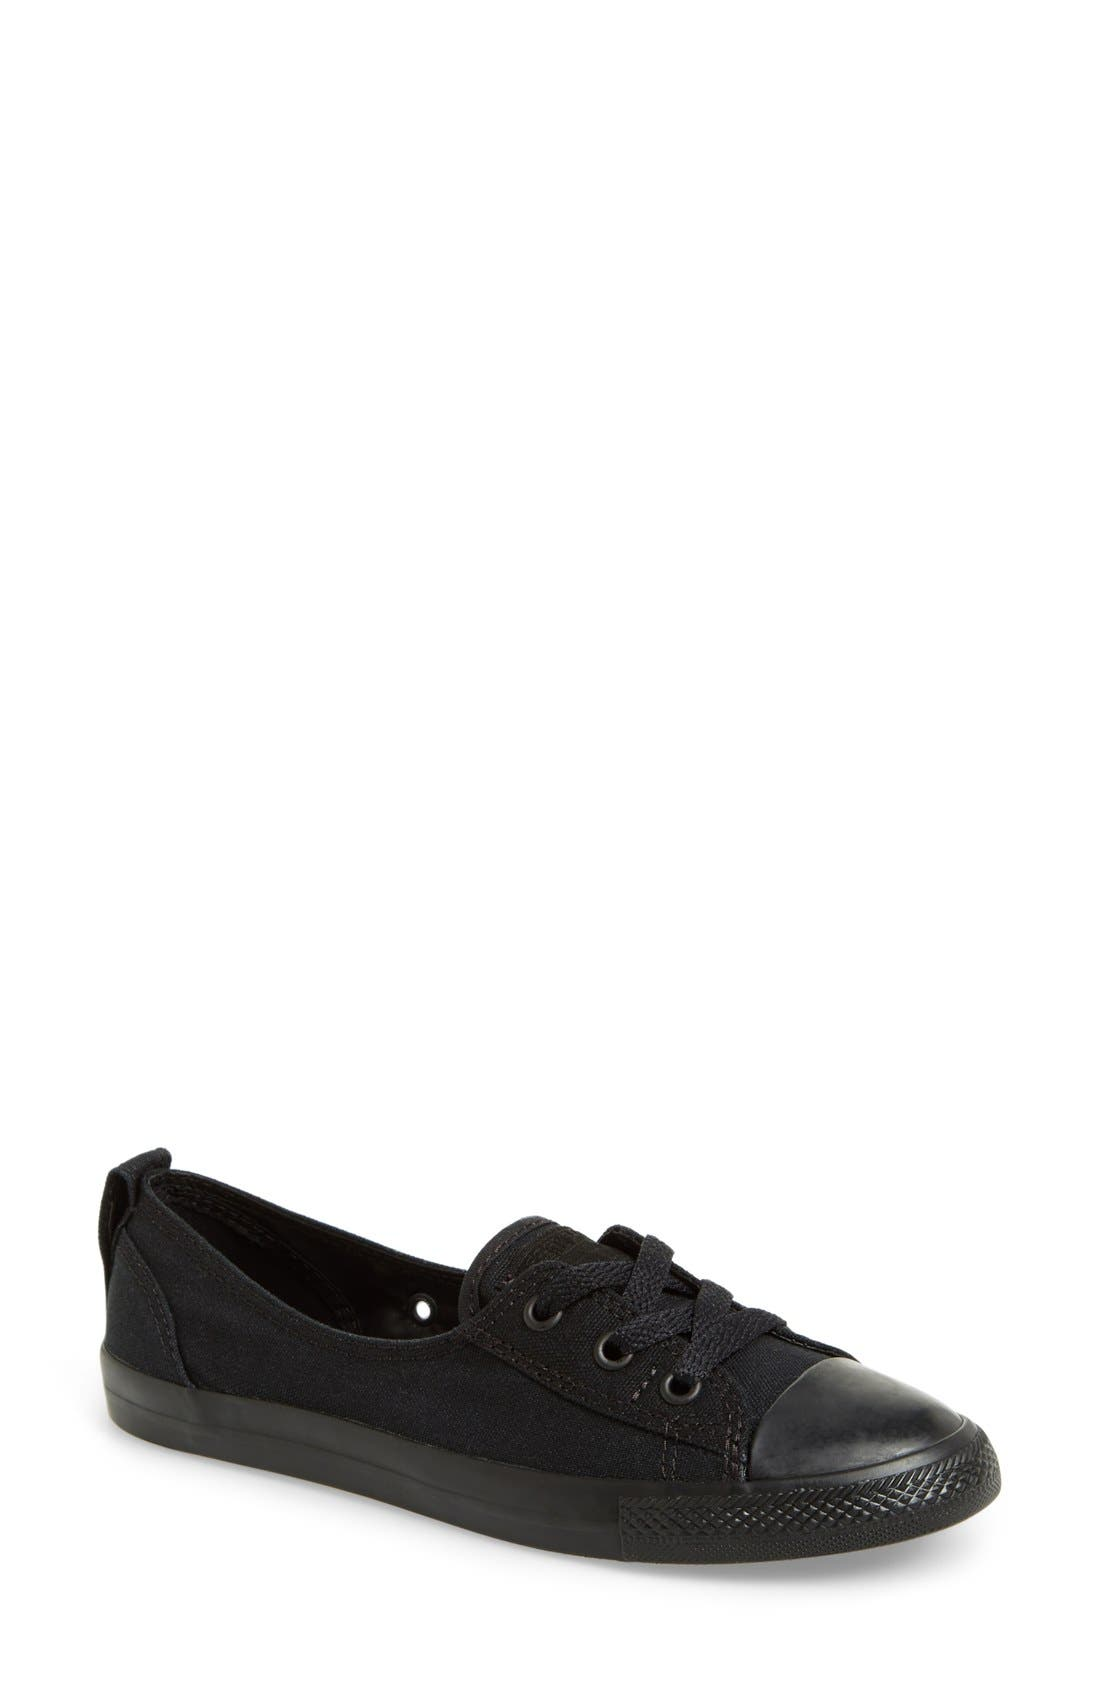 Alternate Image 1 Selected - Converse Chuck Taylor® All Star® Ballet Canvas Sneaker (Women)